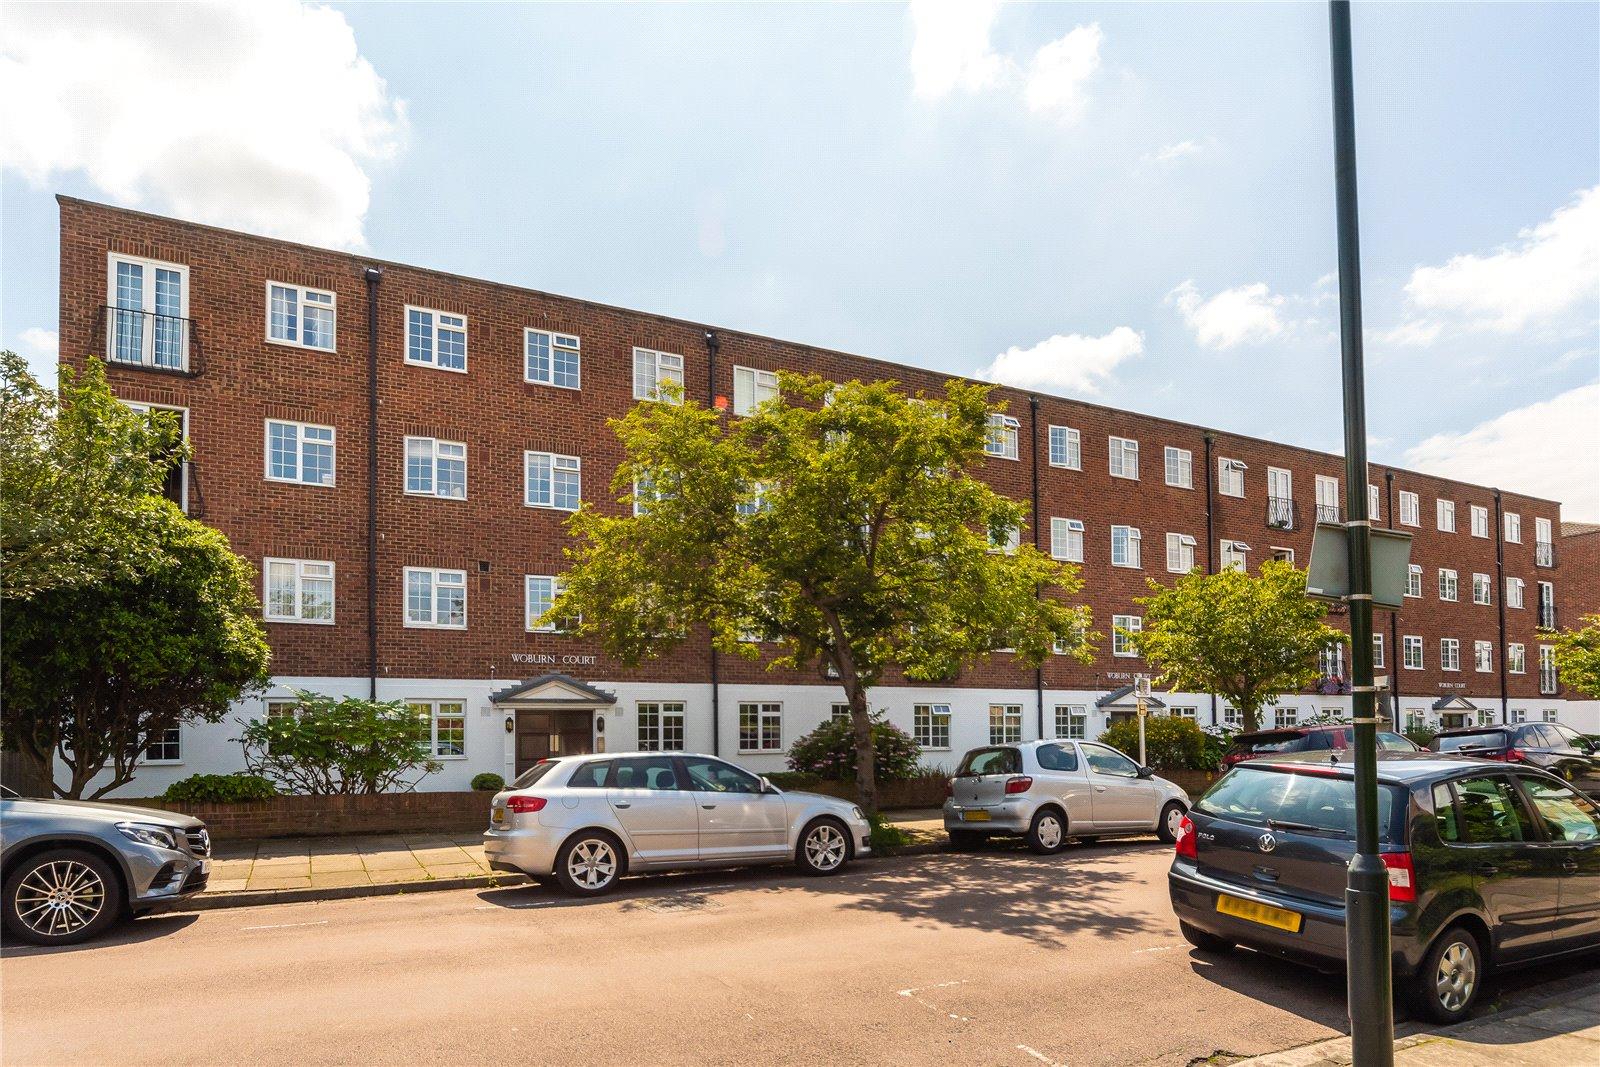 Woburn Court, Stanmore Road, TW9 2DD - Antony Roberts